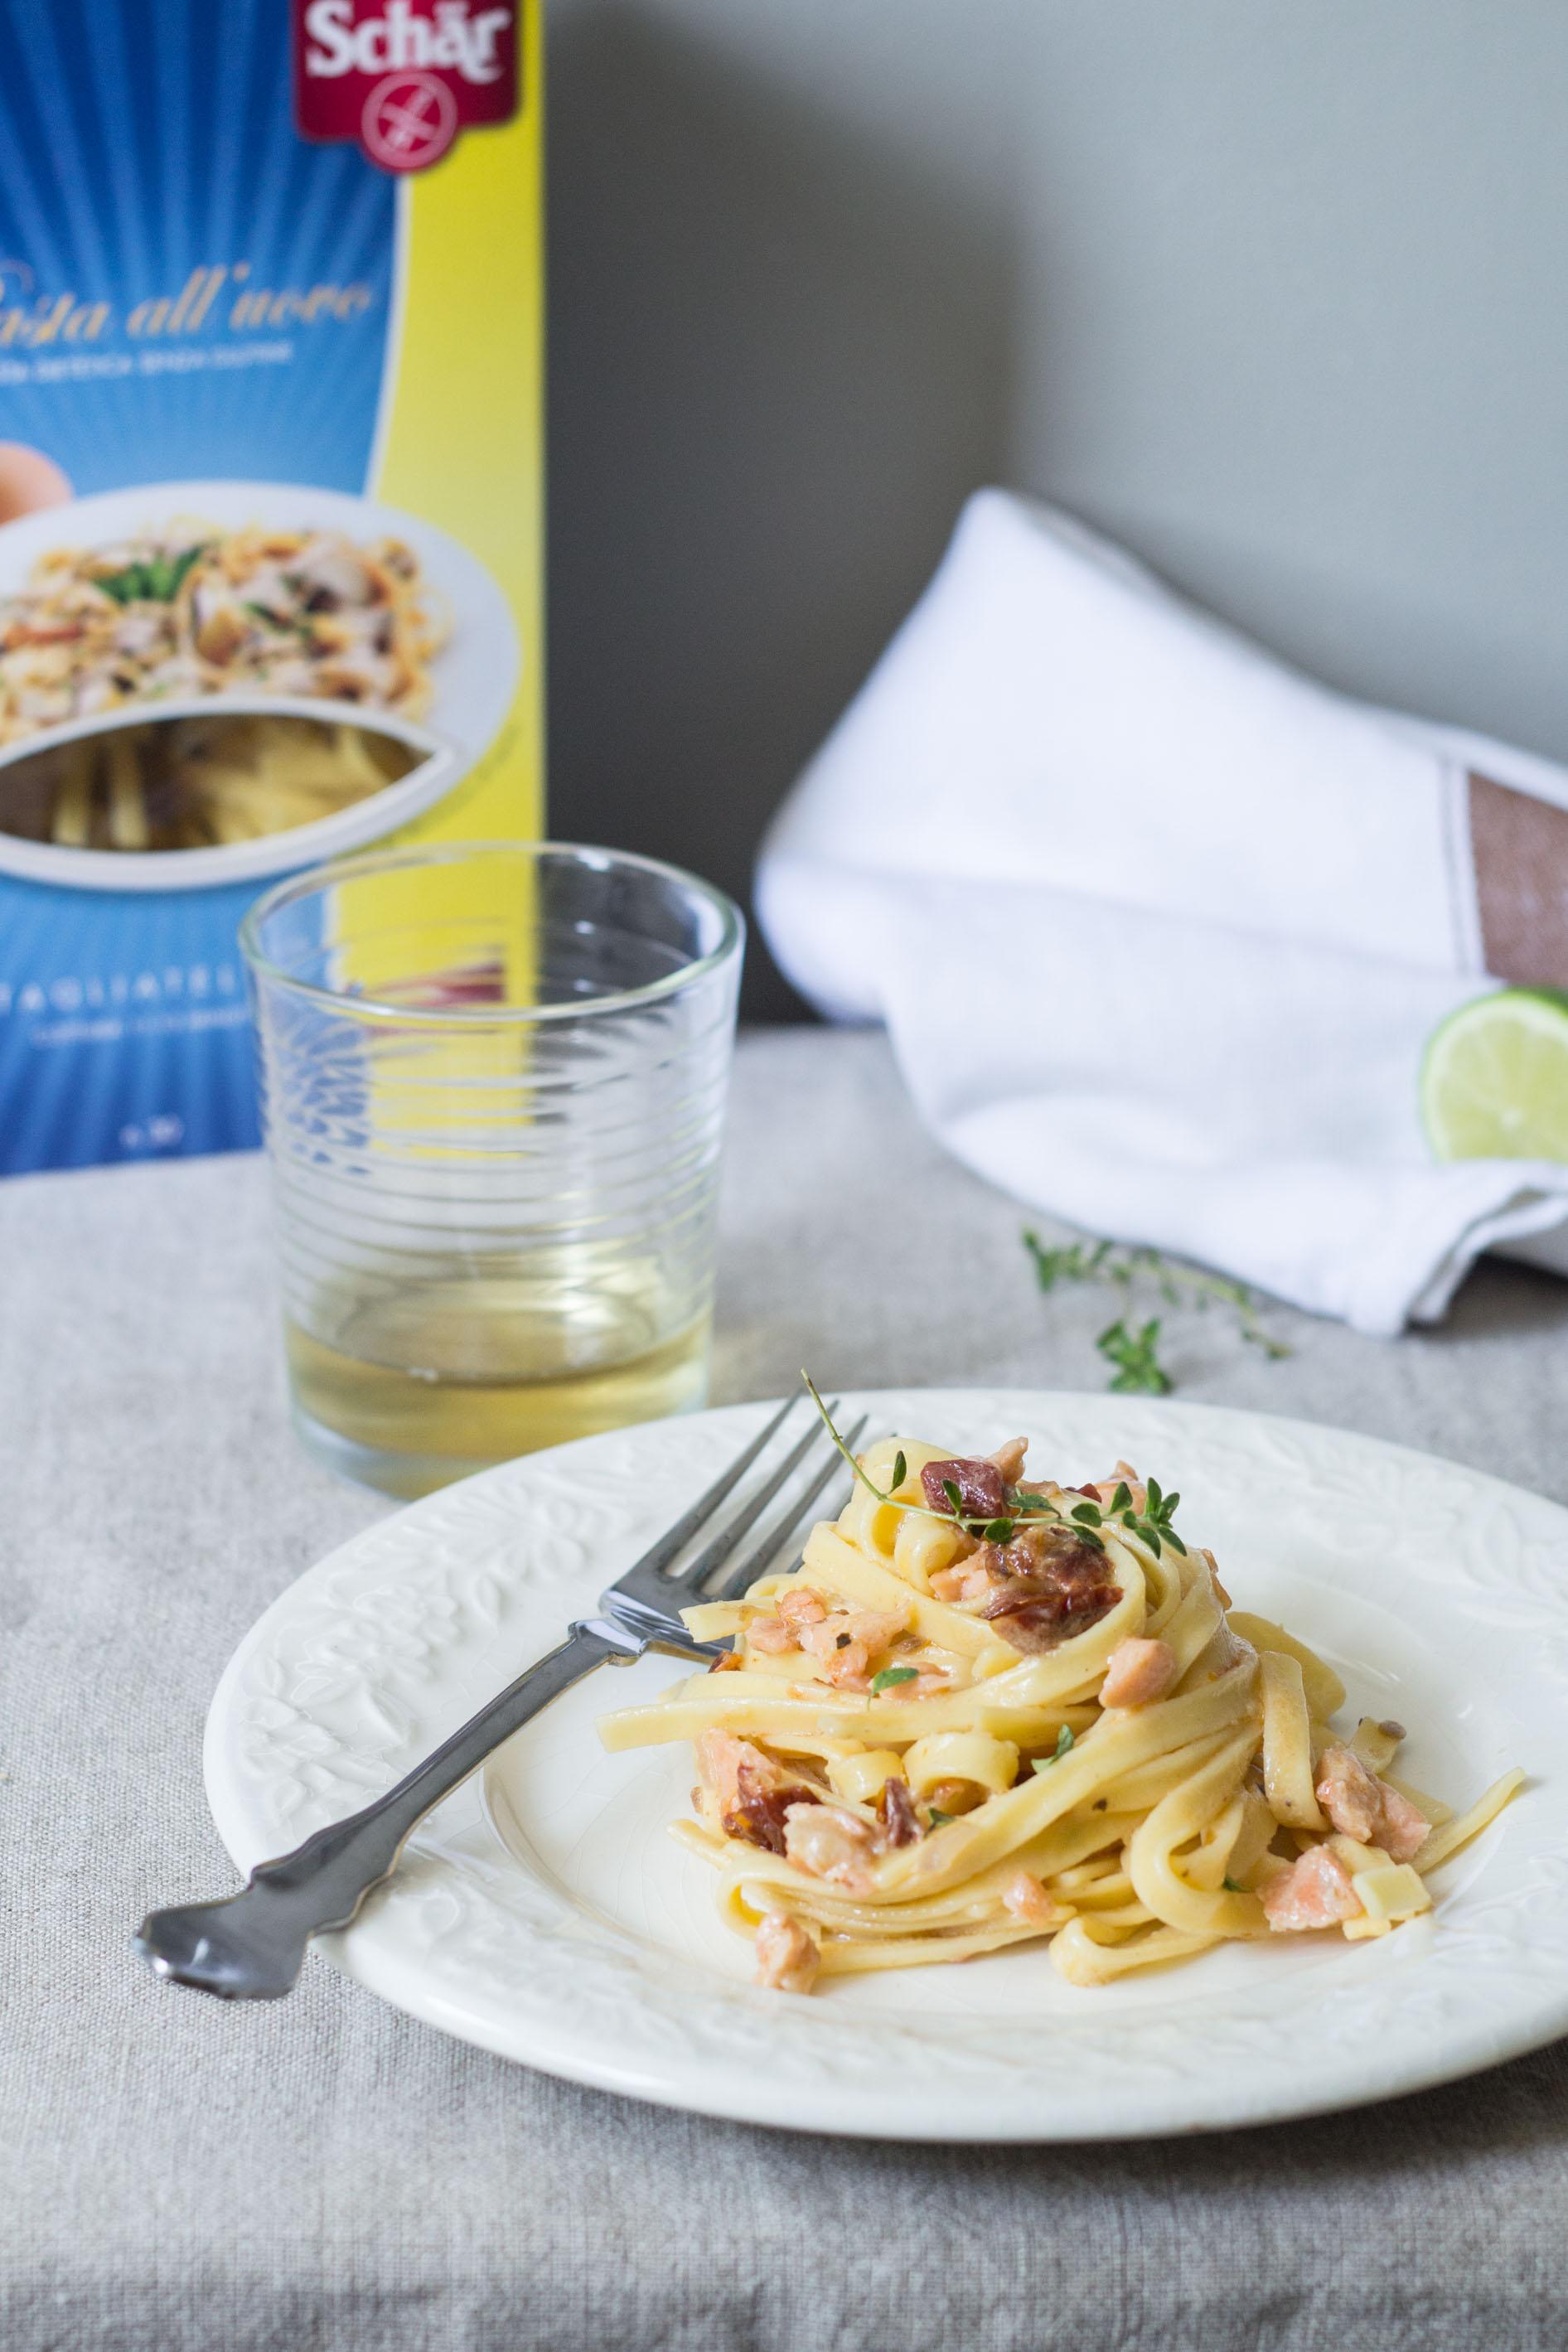 Tagliatelle Schär al salmone - Gluten Free Travel and Living